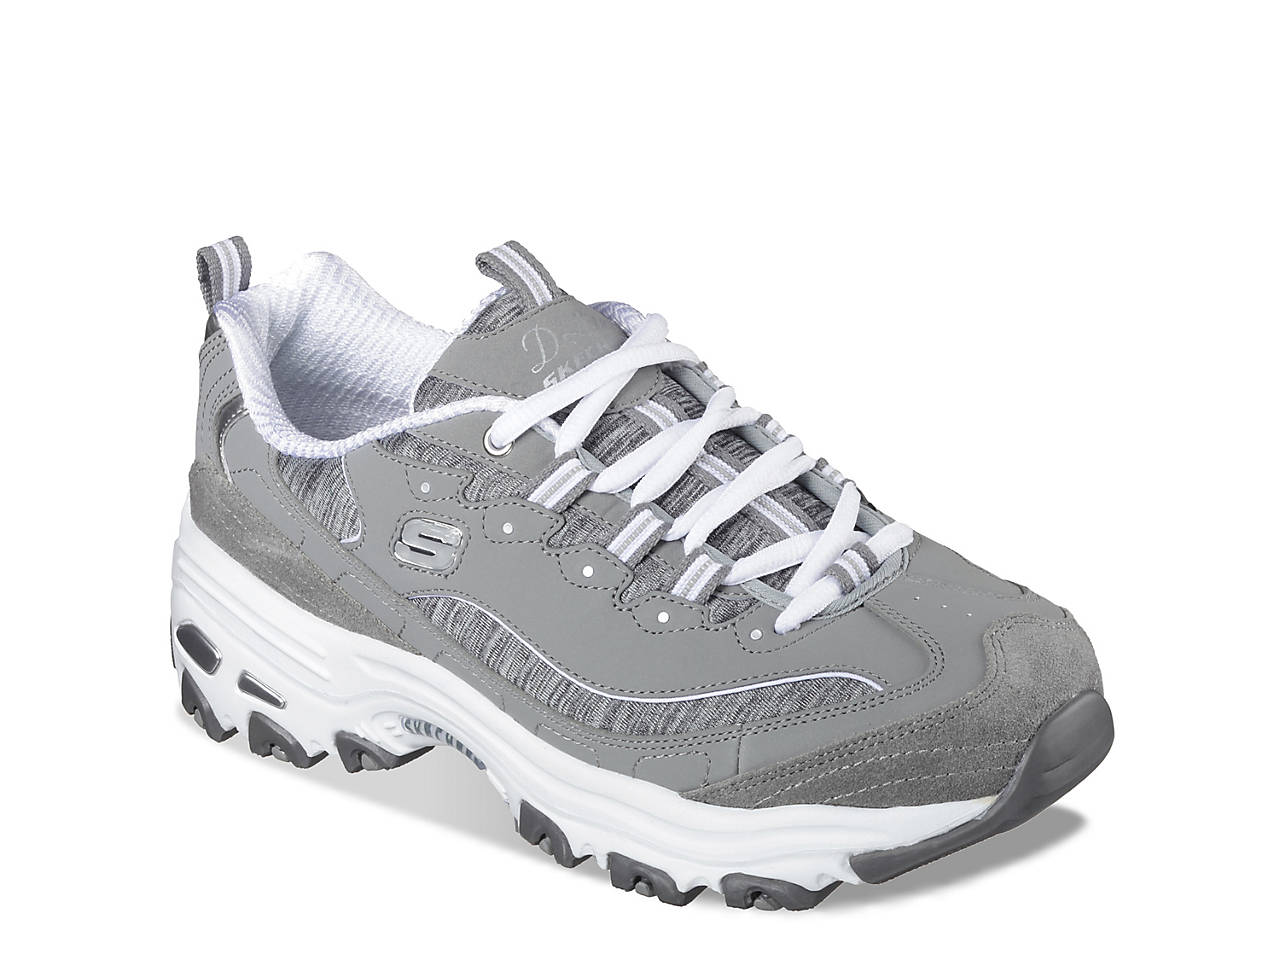 5c25d741af07 Skechers D Lites Me Time Sneaker - Women s Women s Shoes